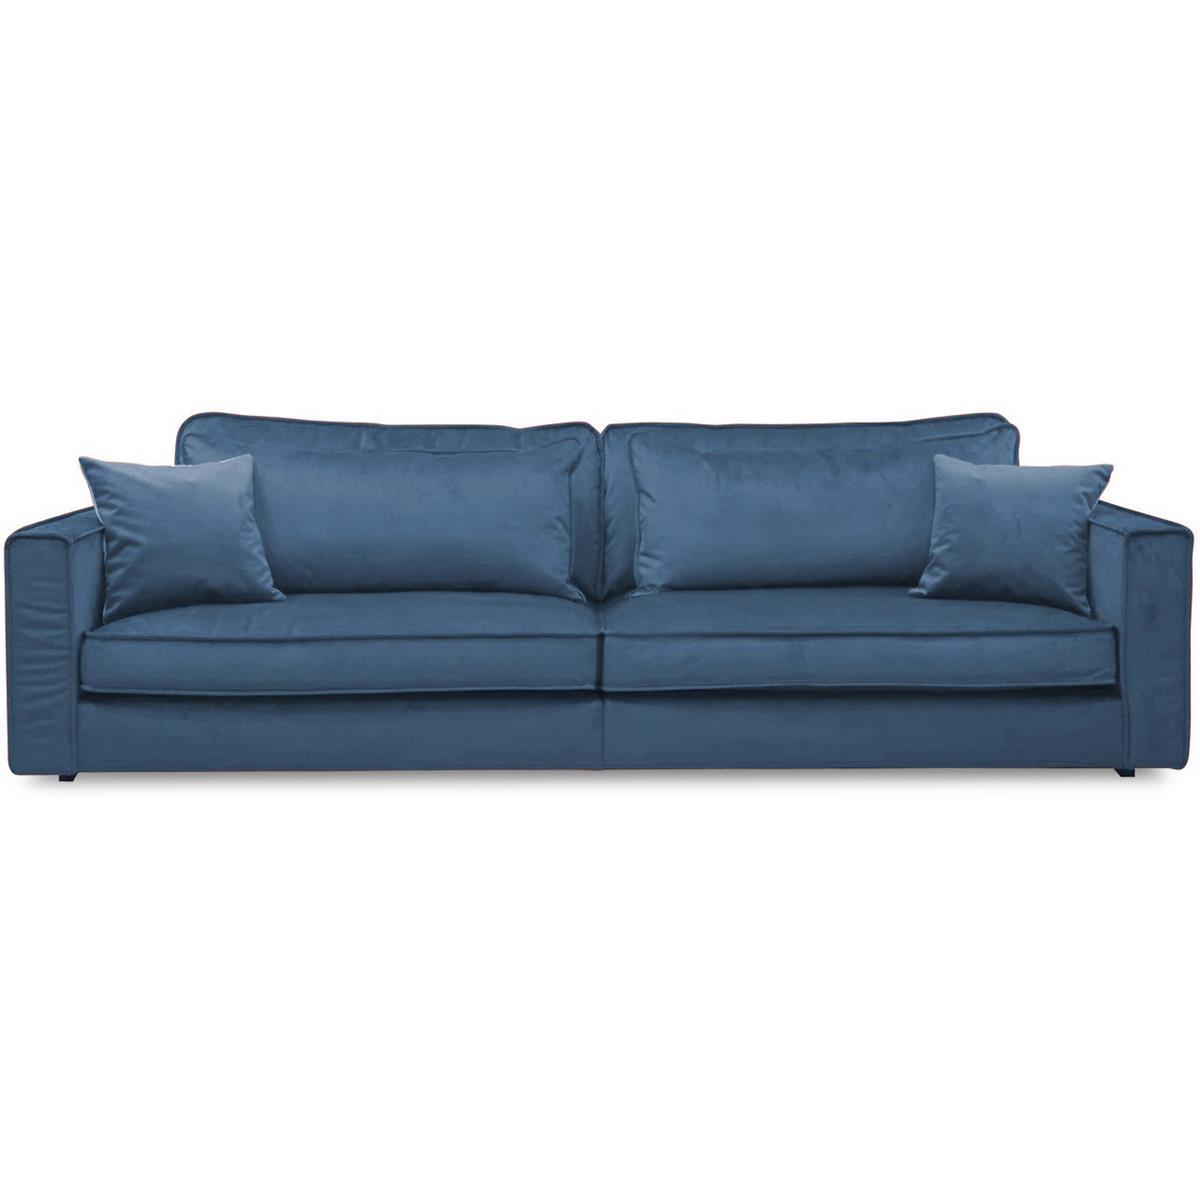 Luca-bluesteel-soffa-fasta-ryggkuddar